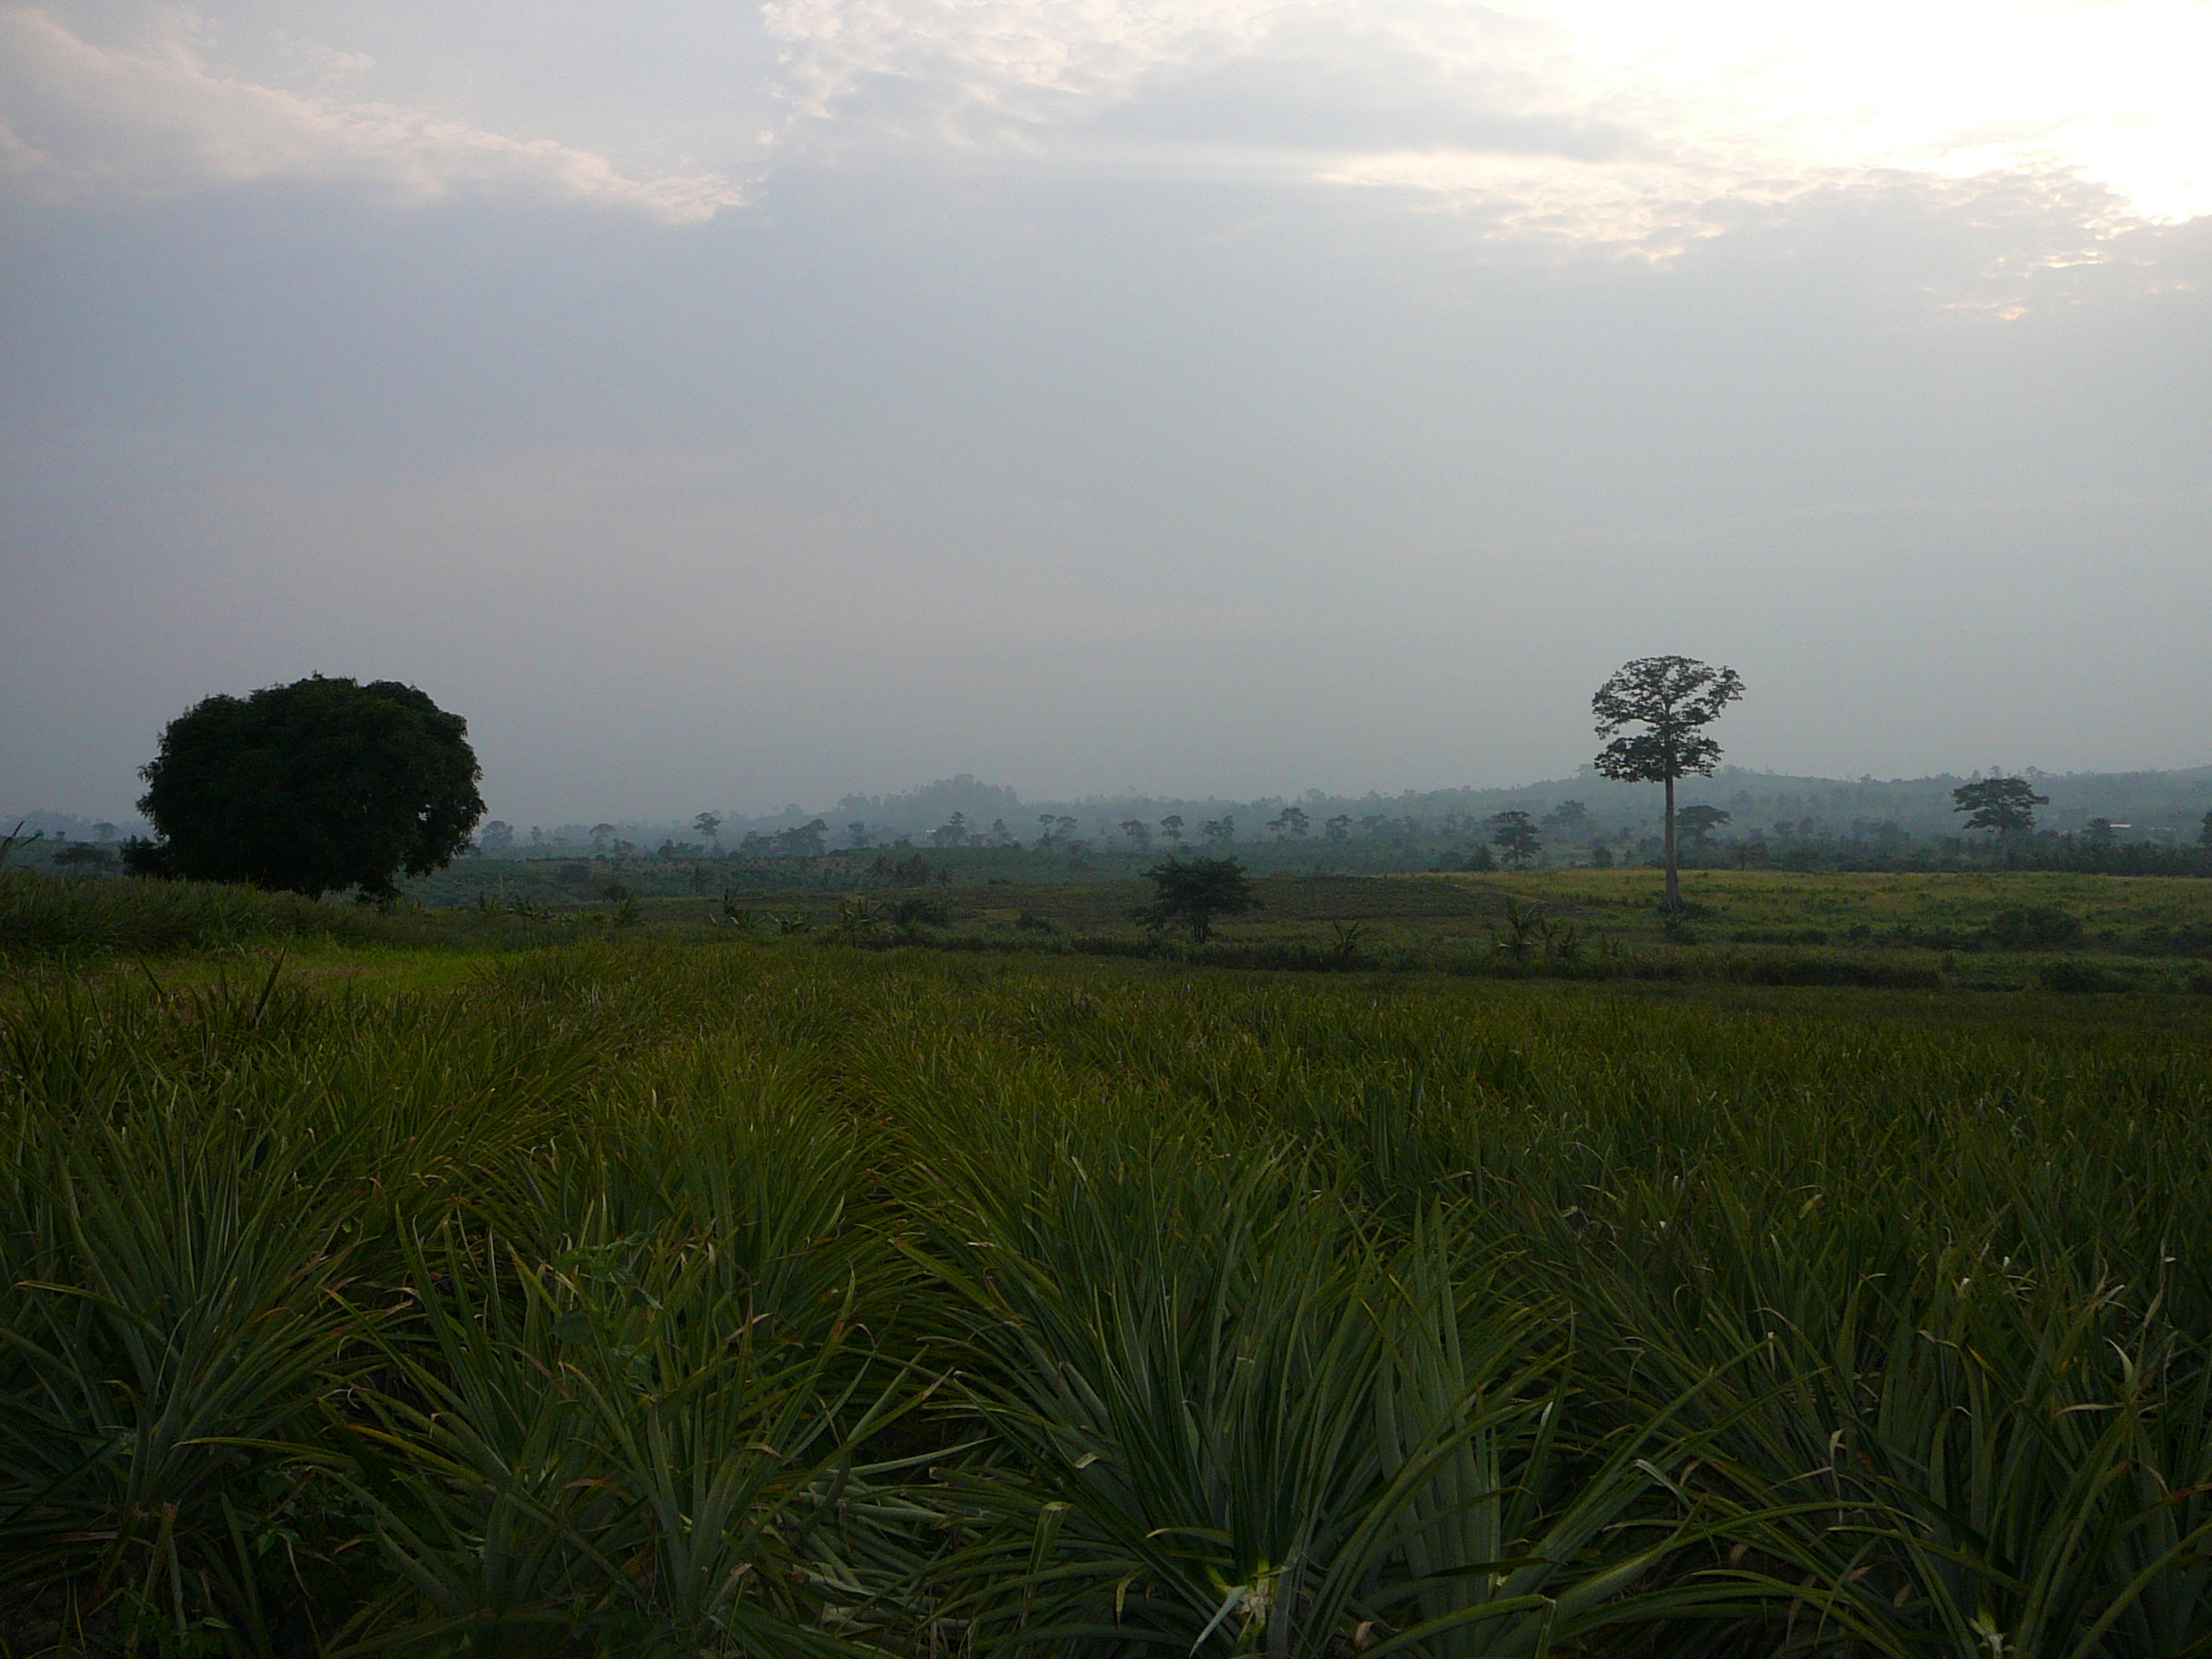 A large pineapple farm with a blue sky in Ghana.